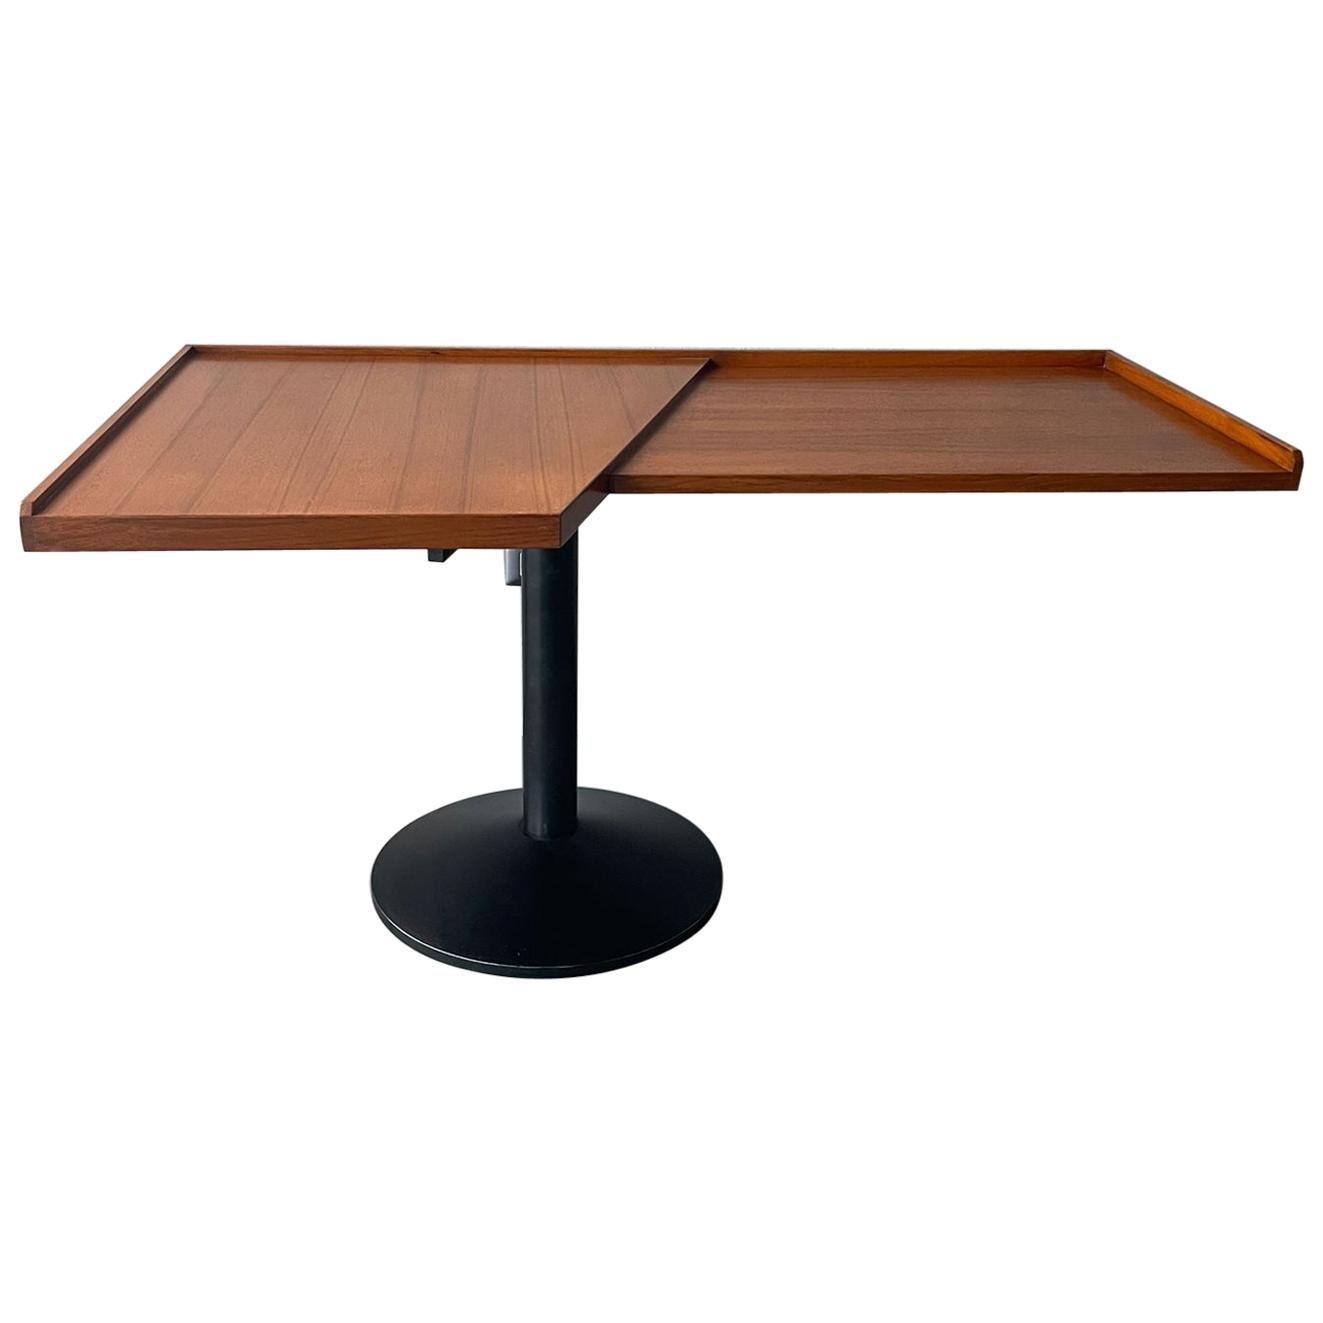 Franco Albini Poggi Wood Steel Desk Mod. Stadera Italy 1958 Excellent Patina